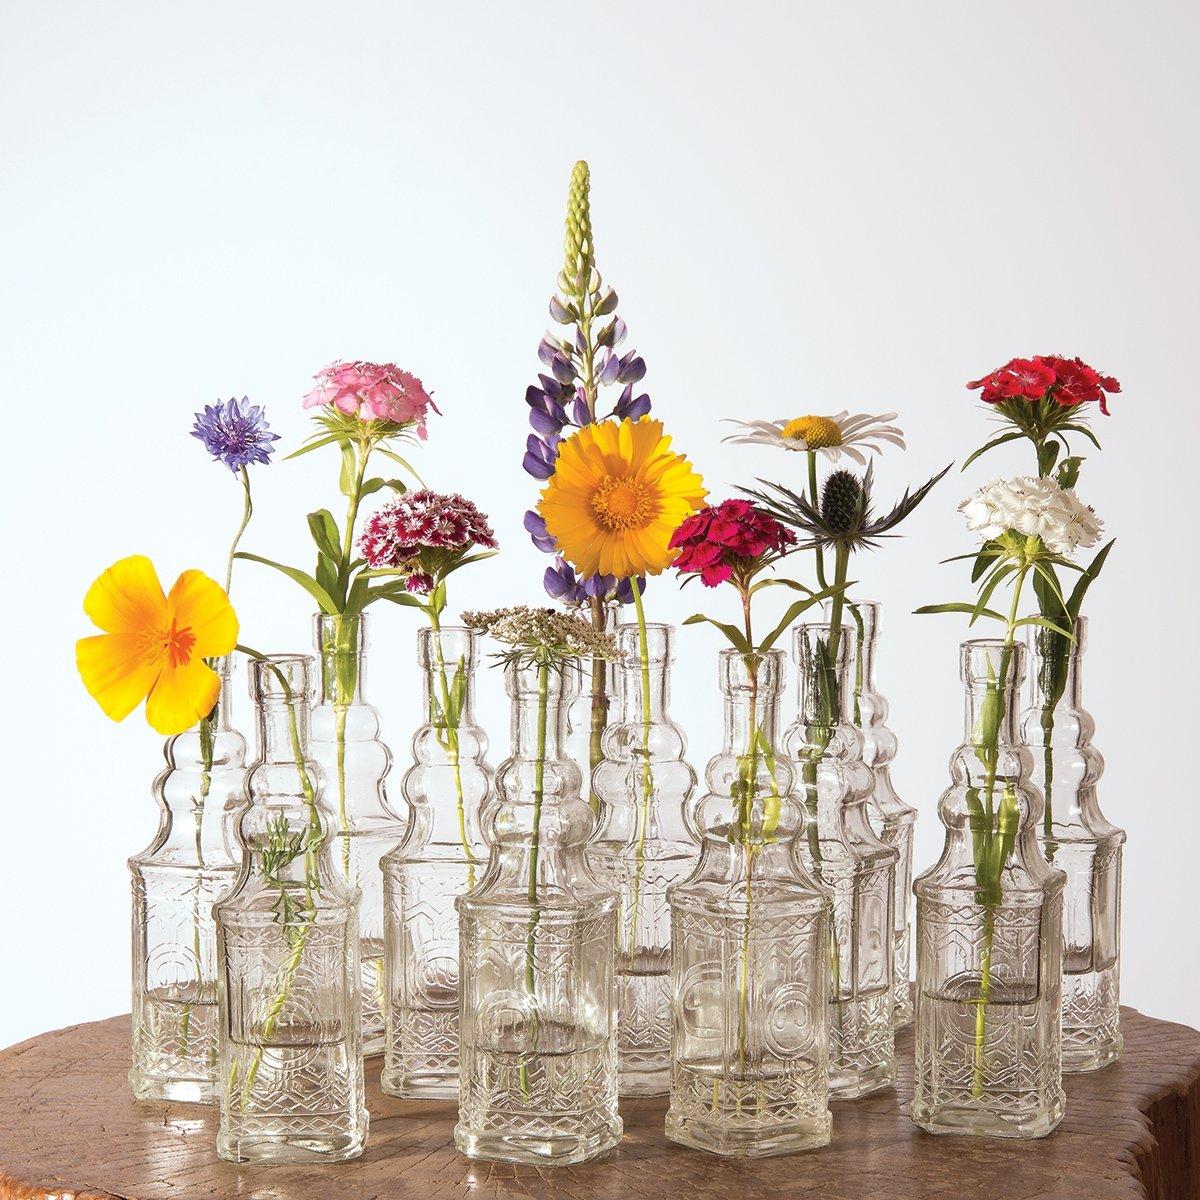 Cheap bulk vases for centerpieces find bulk vases for get quotations luna bazaar small vintage glass bottle set 65 inch square design clear floridaeventfo Choice Image